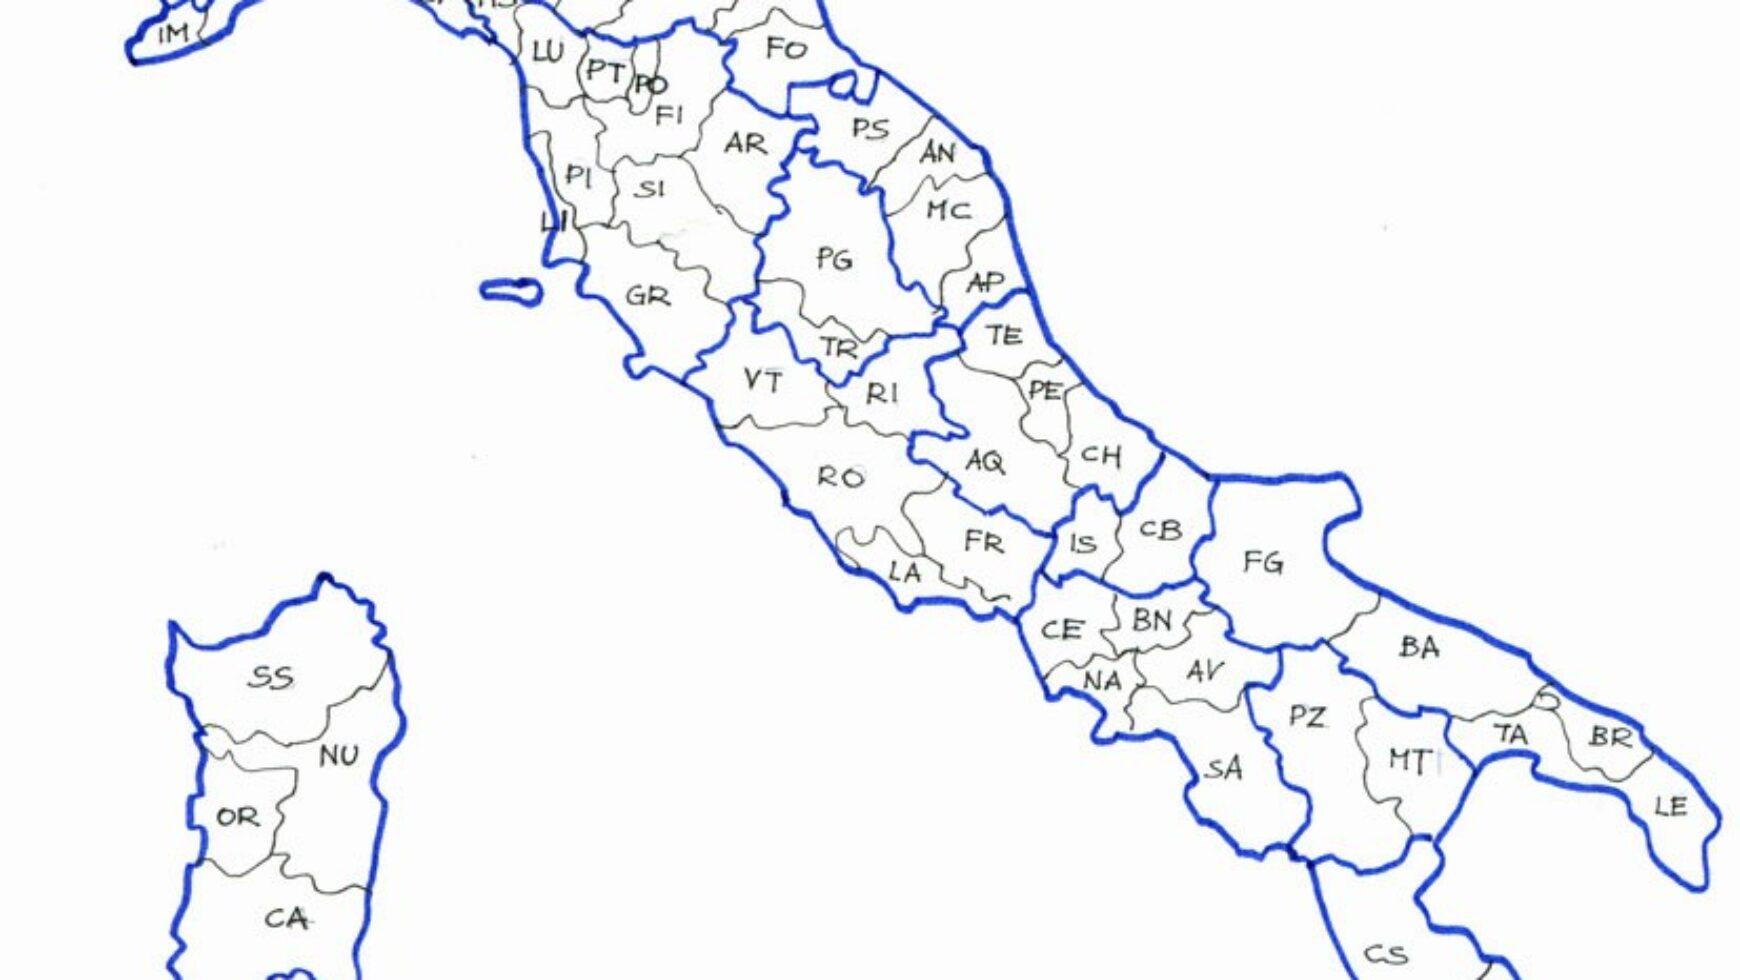 Prevenire l'usura in Puglia